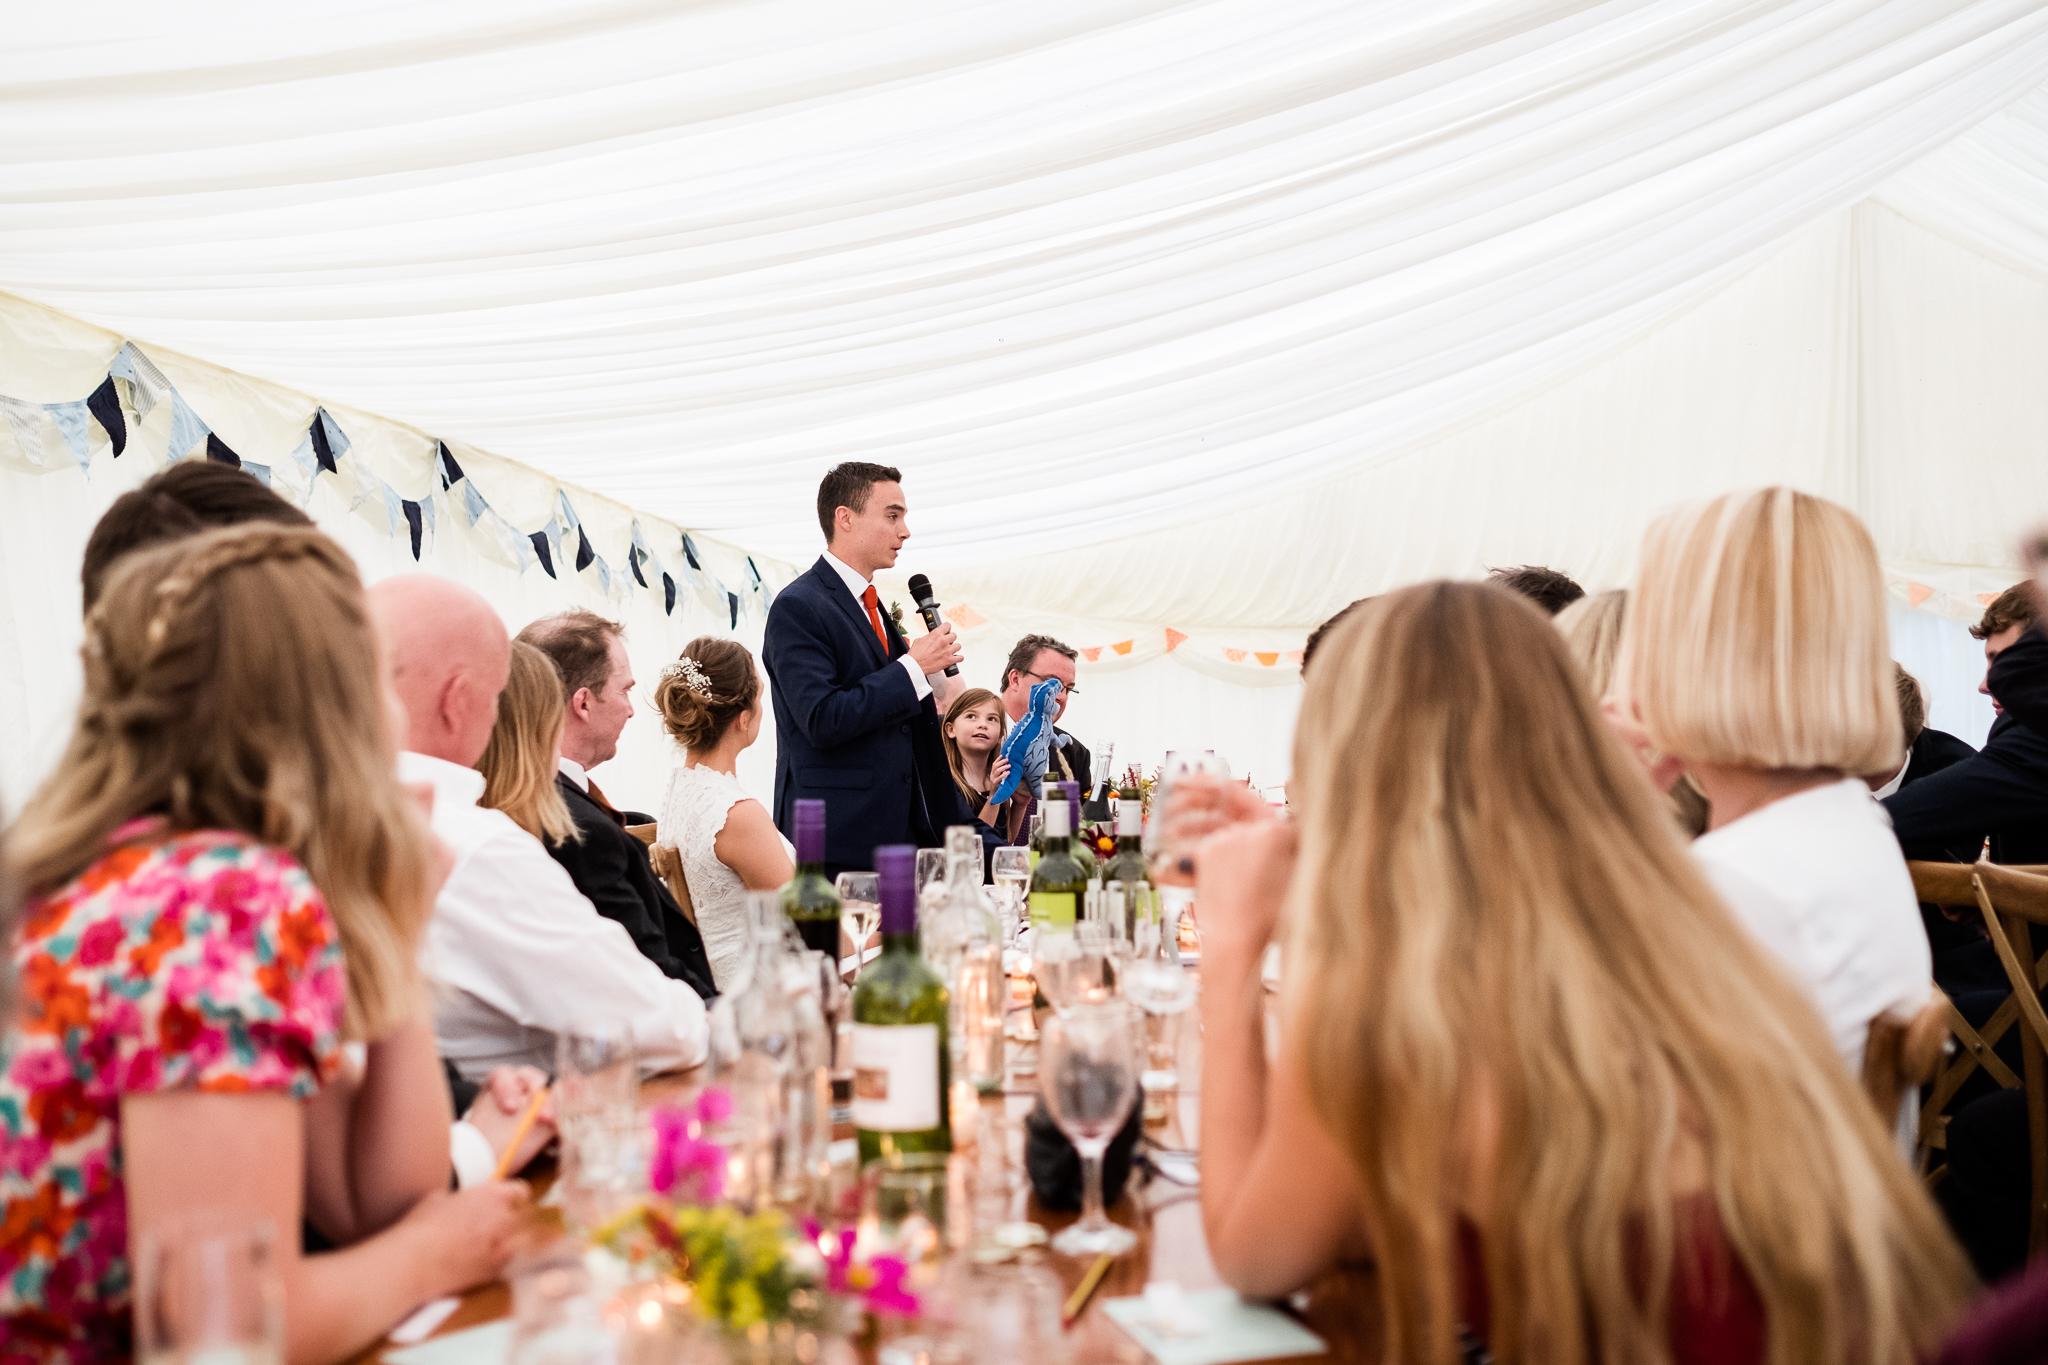 Relaxed Documentary Wedding Photography at The Wizard Inn, Alderley Edge Cheshire - Jenny Harper-70.jpg